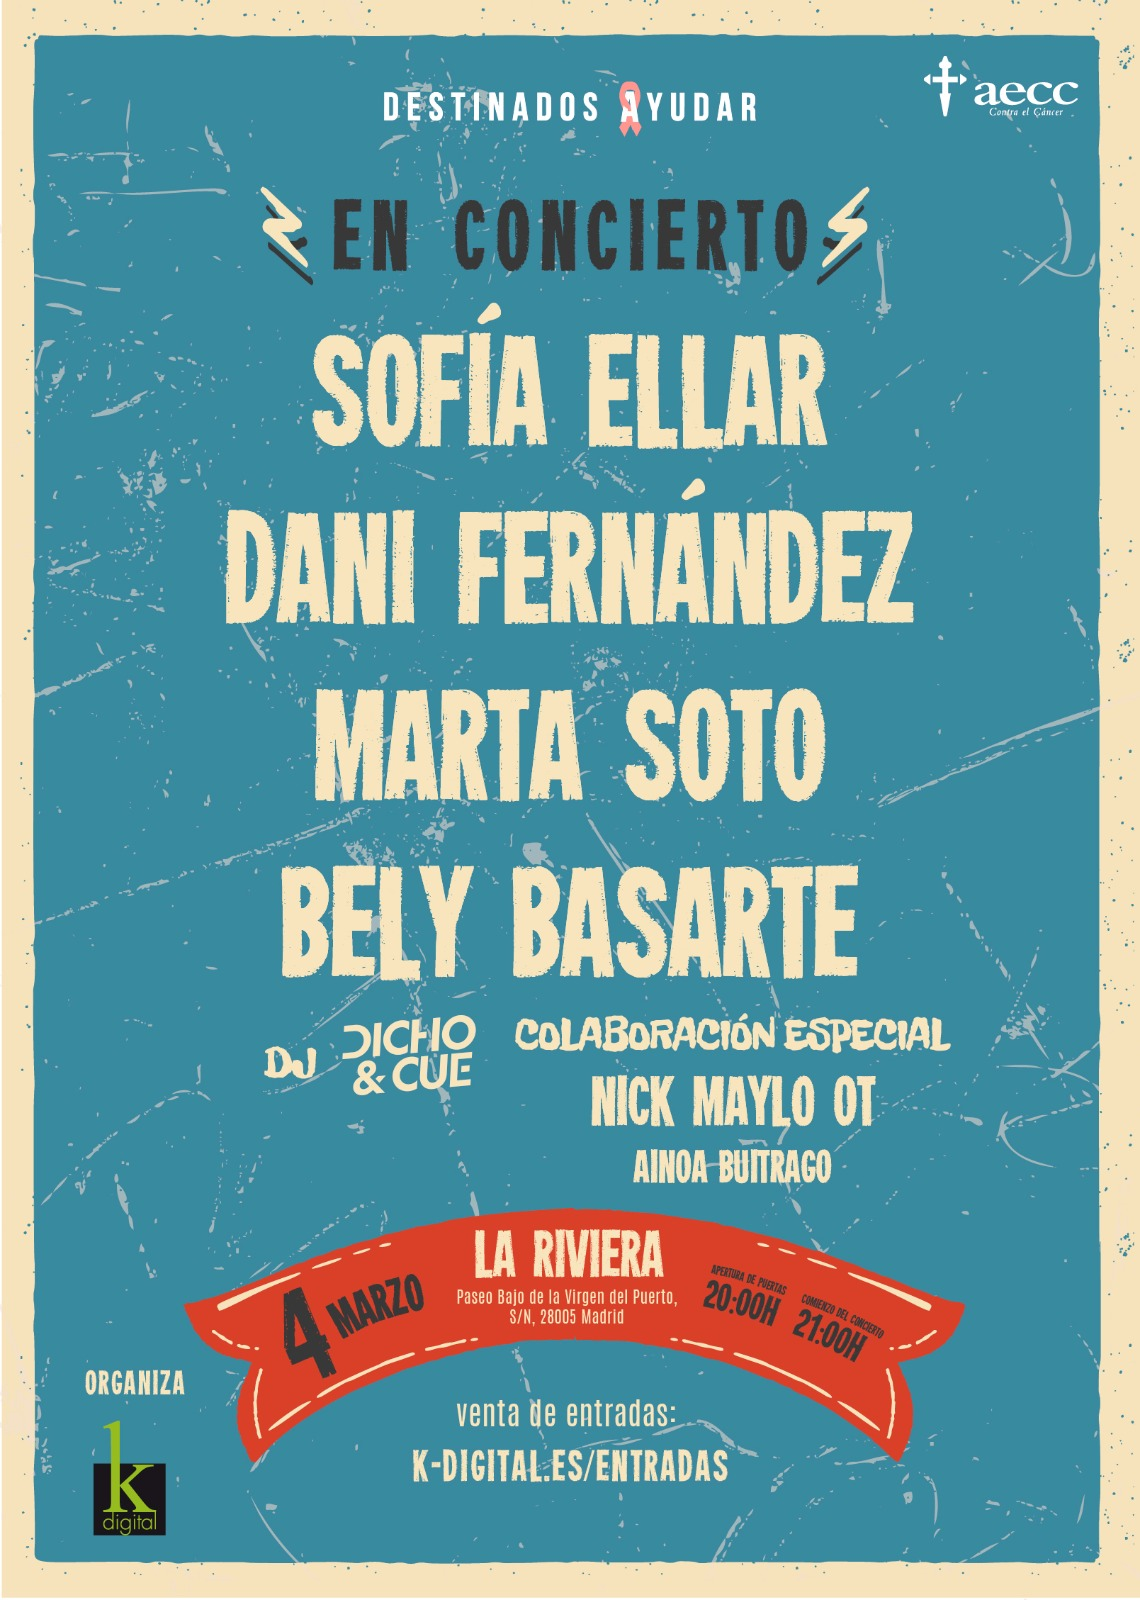 Bely Basarte + Sofía Ellar + Dani Fernández concert in Madrid